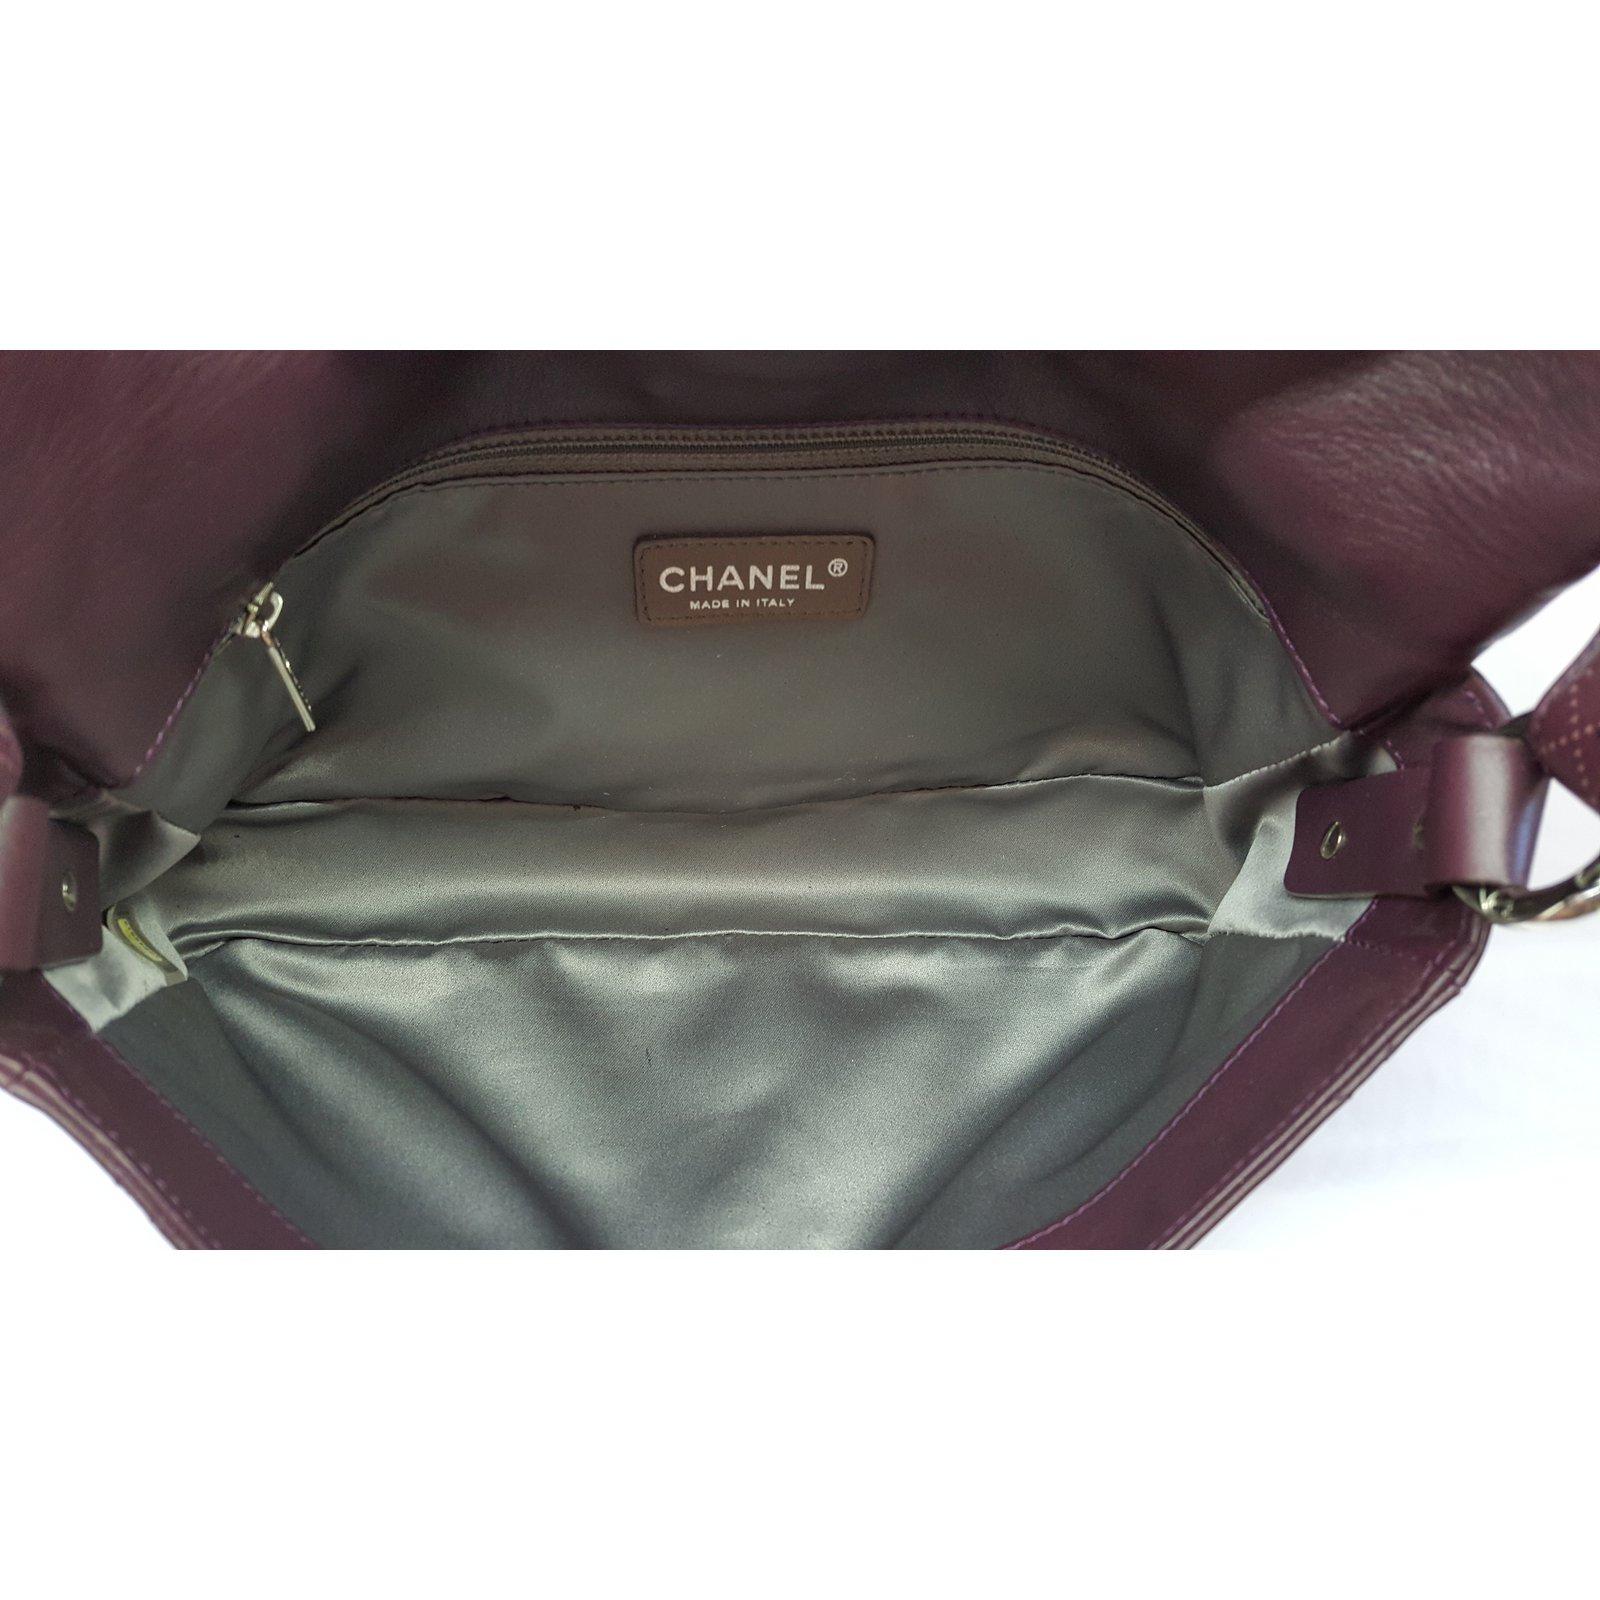 f997c2d9aaa2 Chanel Prune lambskin leather bag Handbags Leather Prune ref.81774 - Joli  Closet